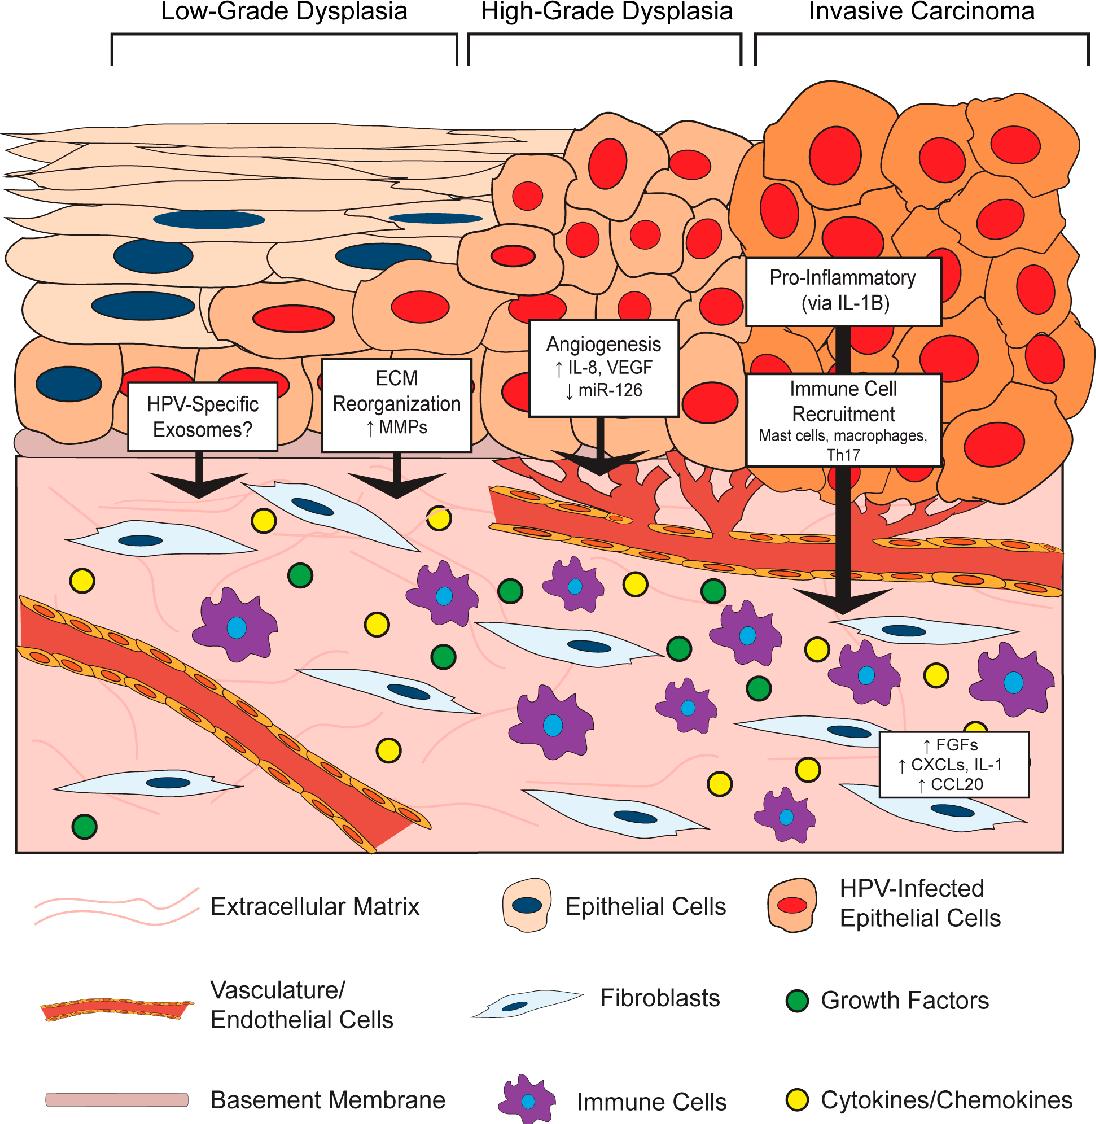 human papillomavirus replication cycle